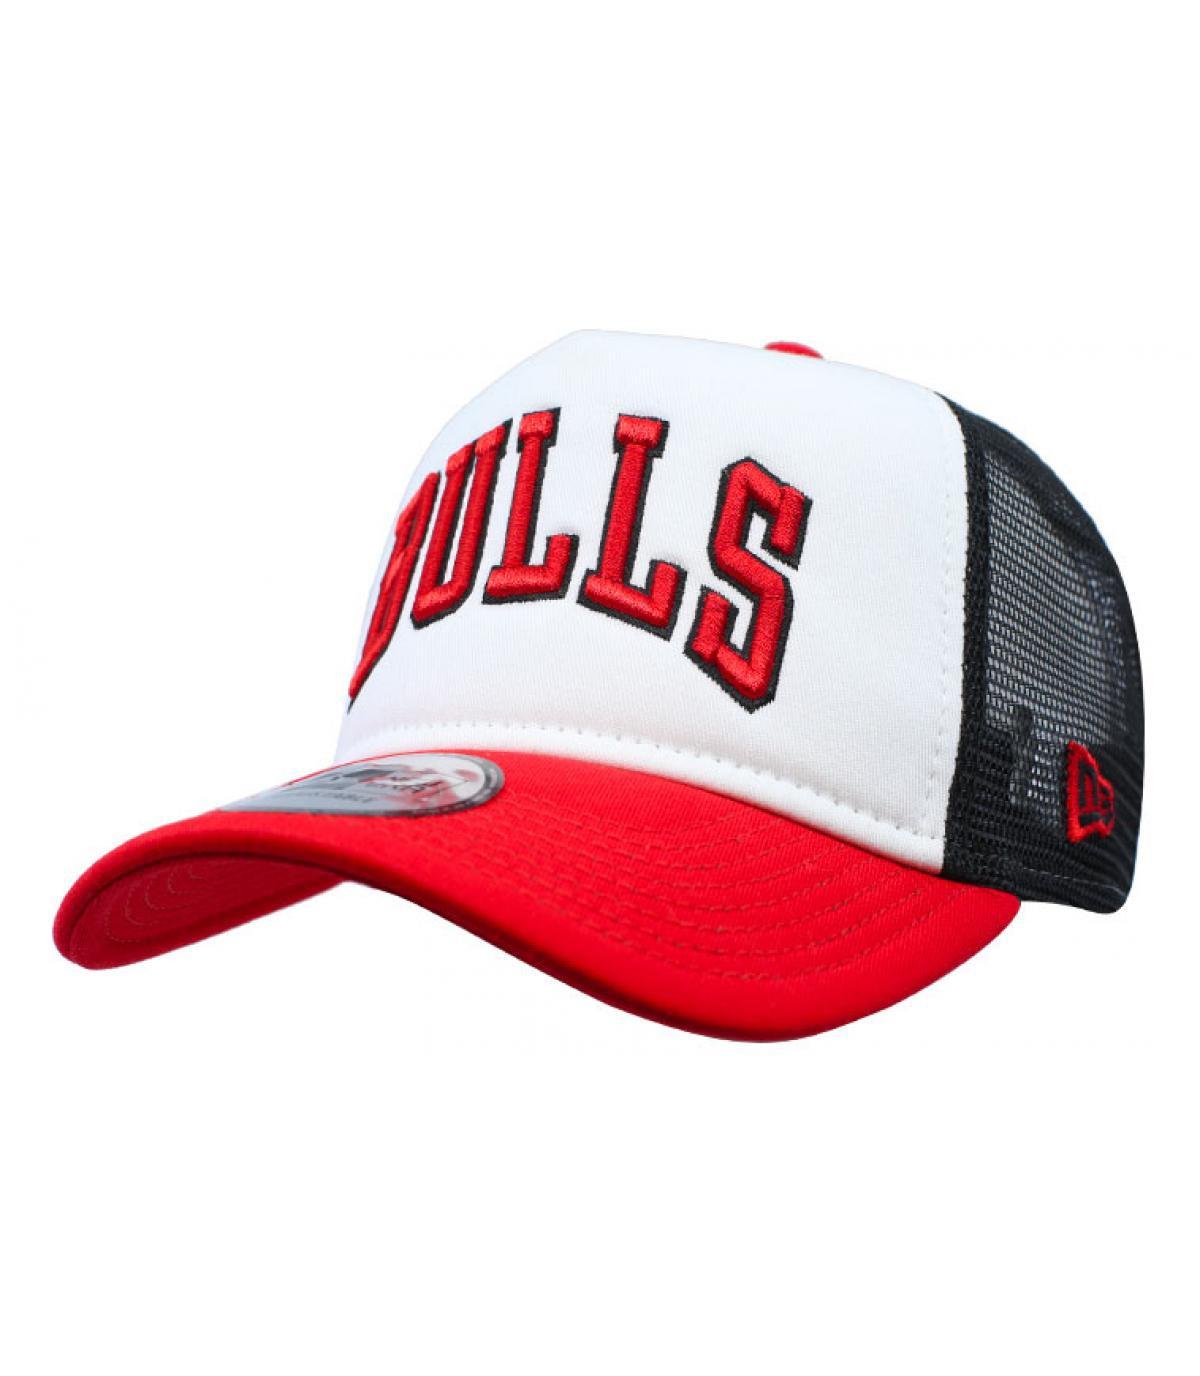 red Bulls trucker